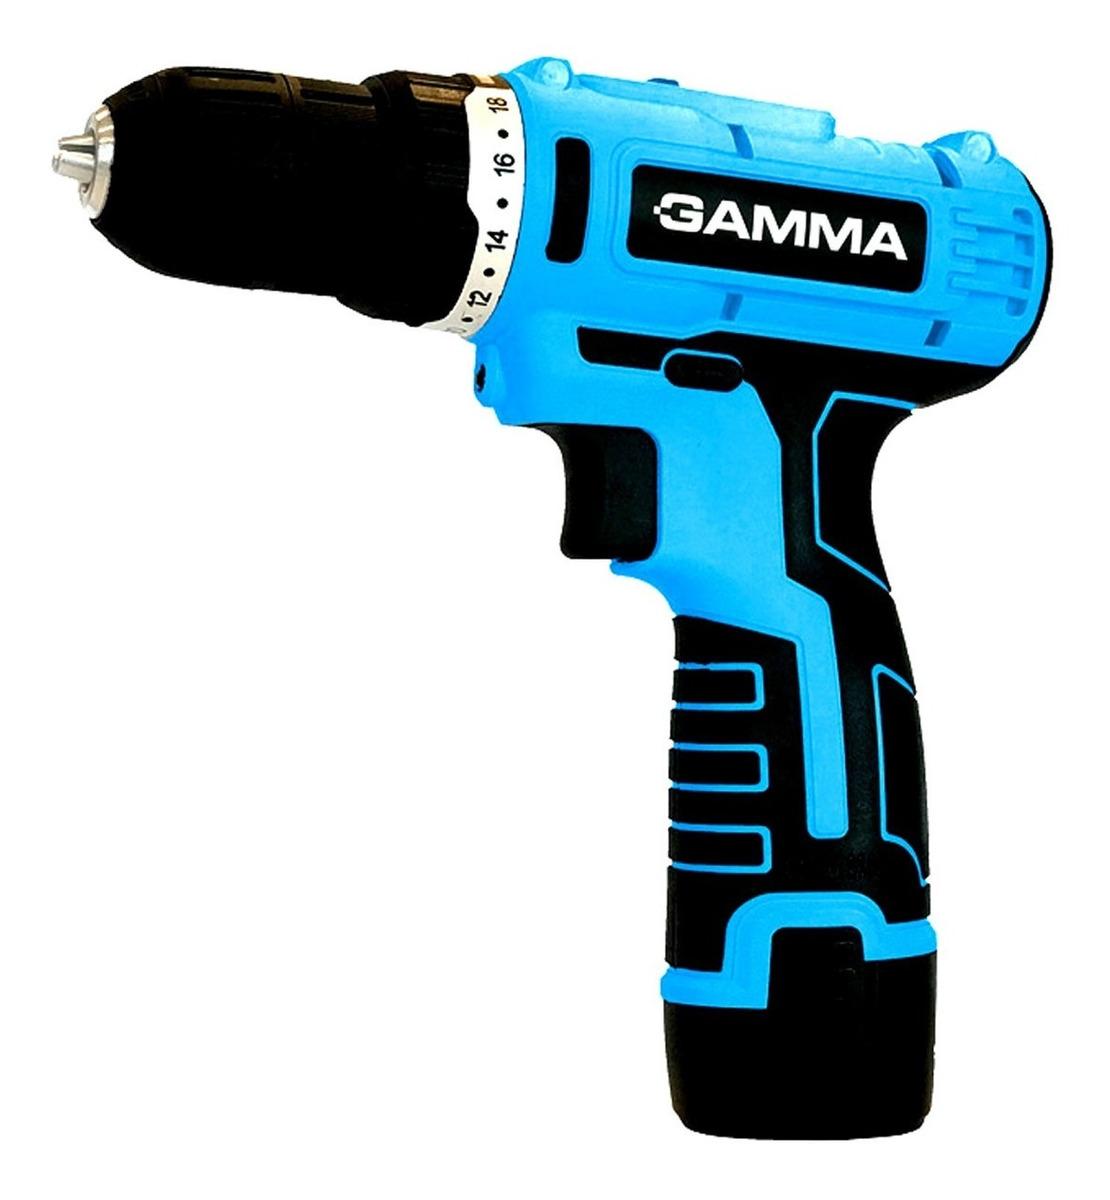 Taladro Inalambrico 12v Litio Gamma G12101ar  +2 Baterias